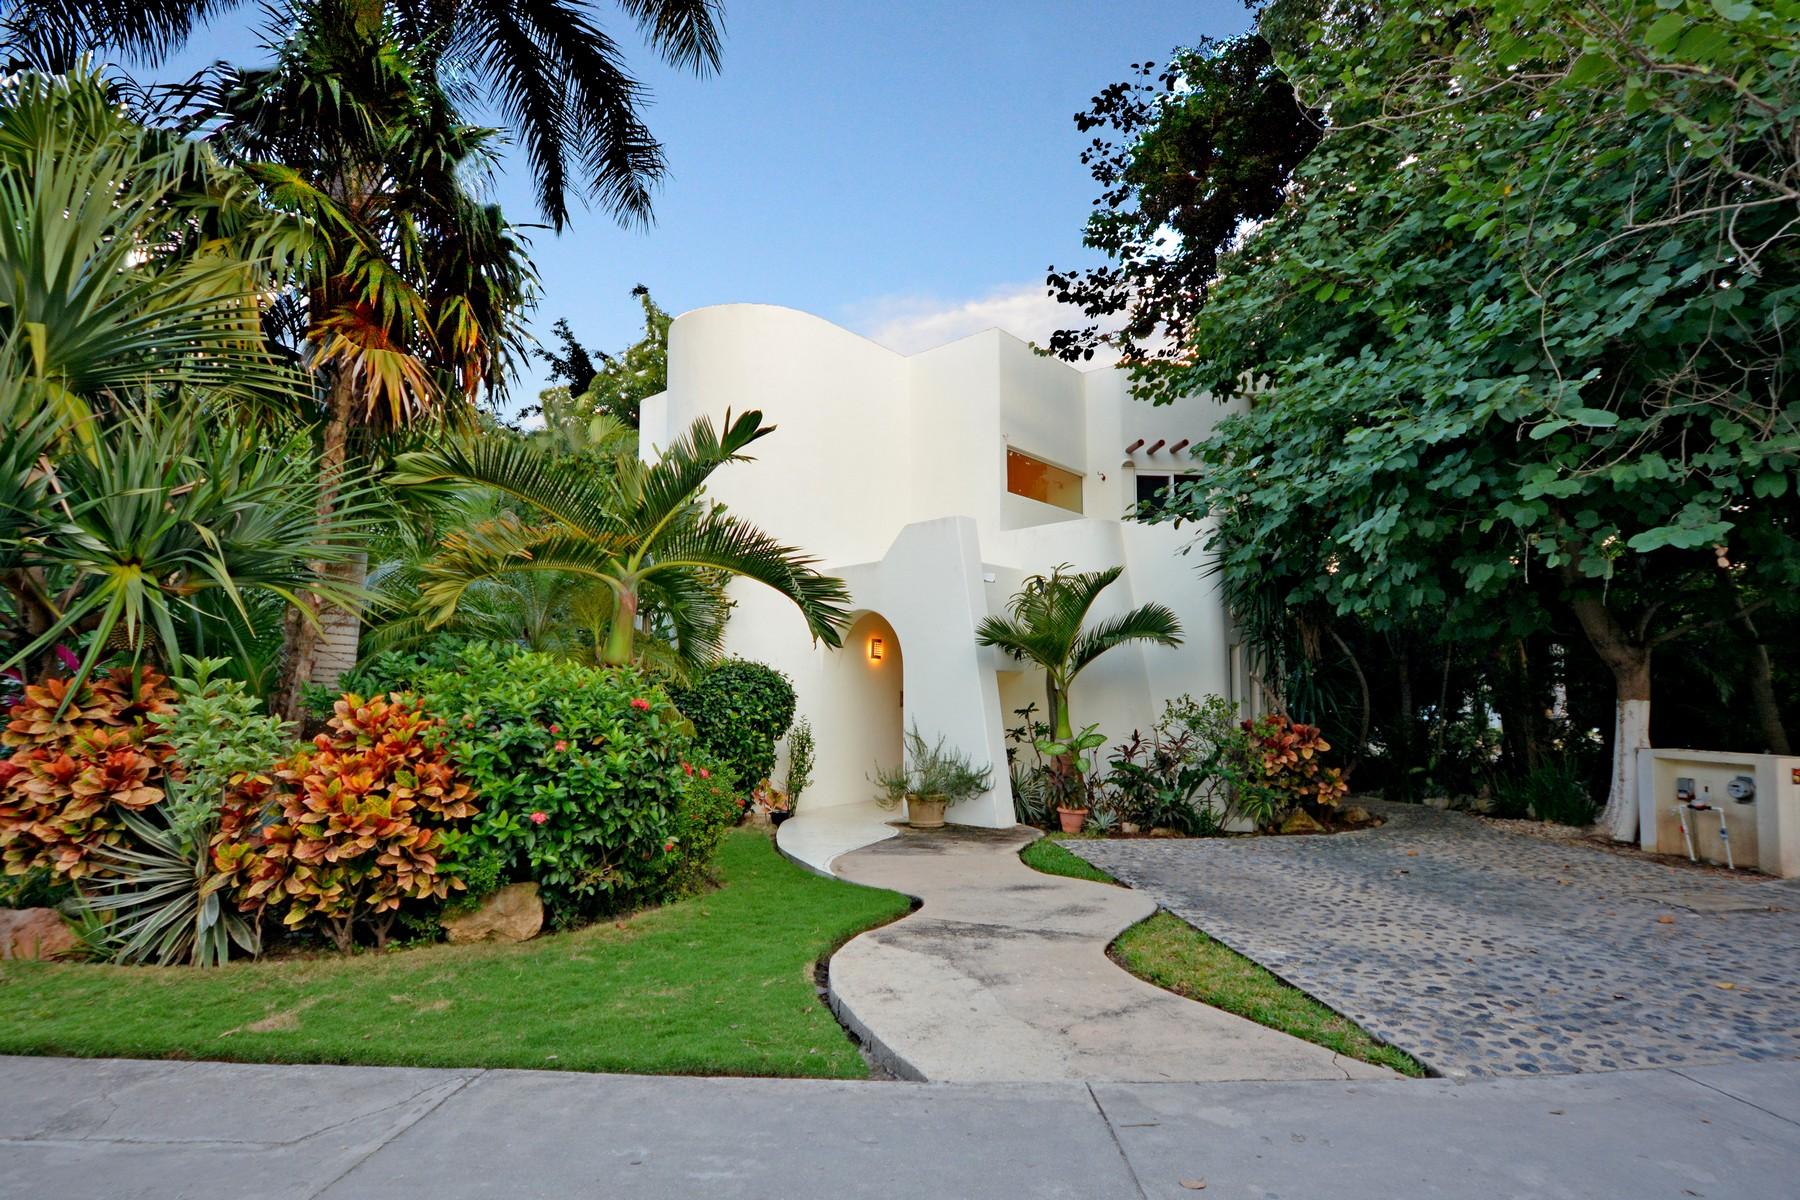 Casa Unifamiliar por un Venta en CASA CARLOTTA Casa Carlotta Paseo Xaman Ha, lot 53, mza 22, Club Real Playa Del Carmen, Quintana Roo 77710 México